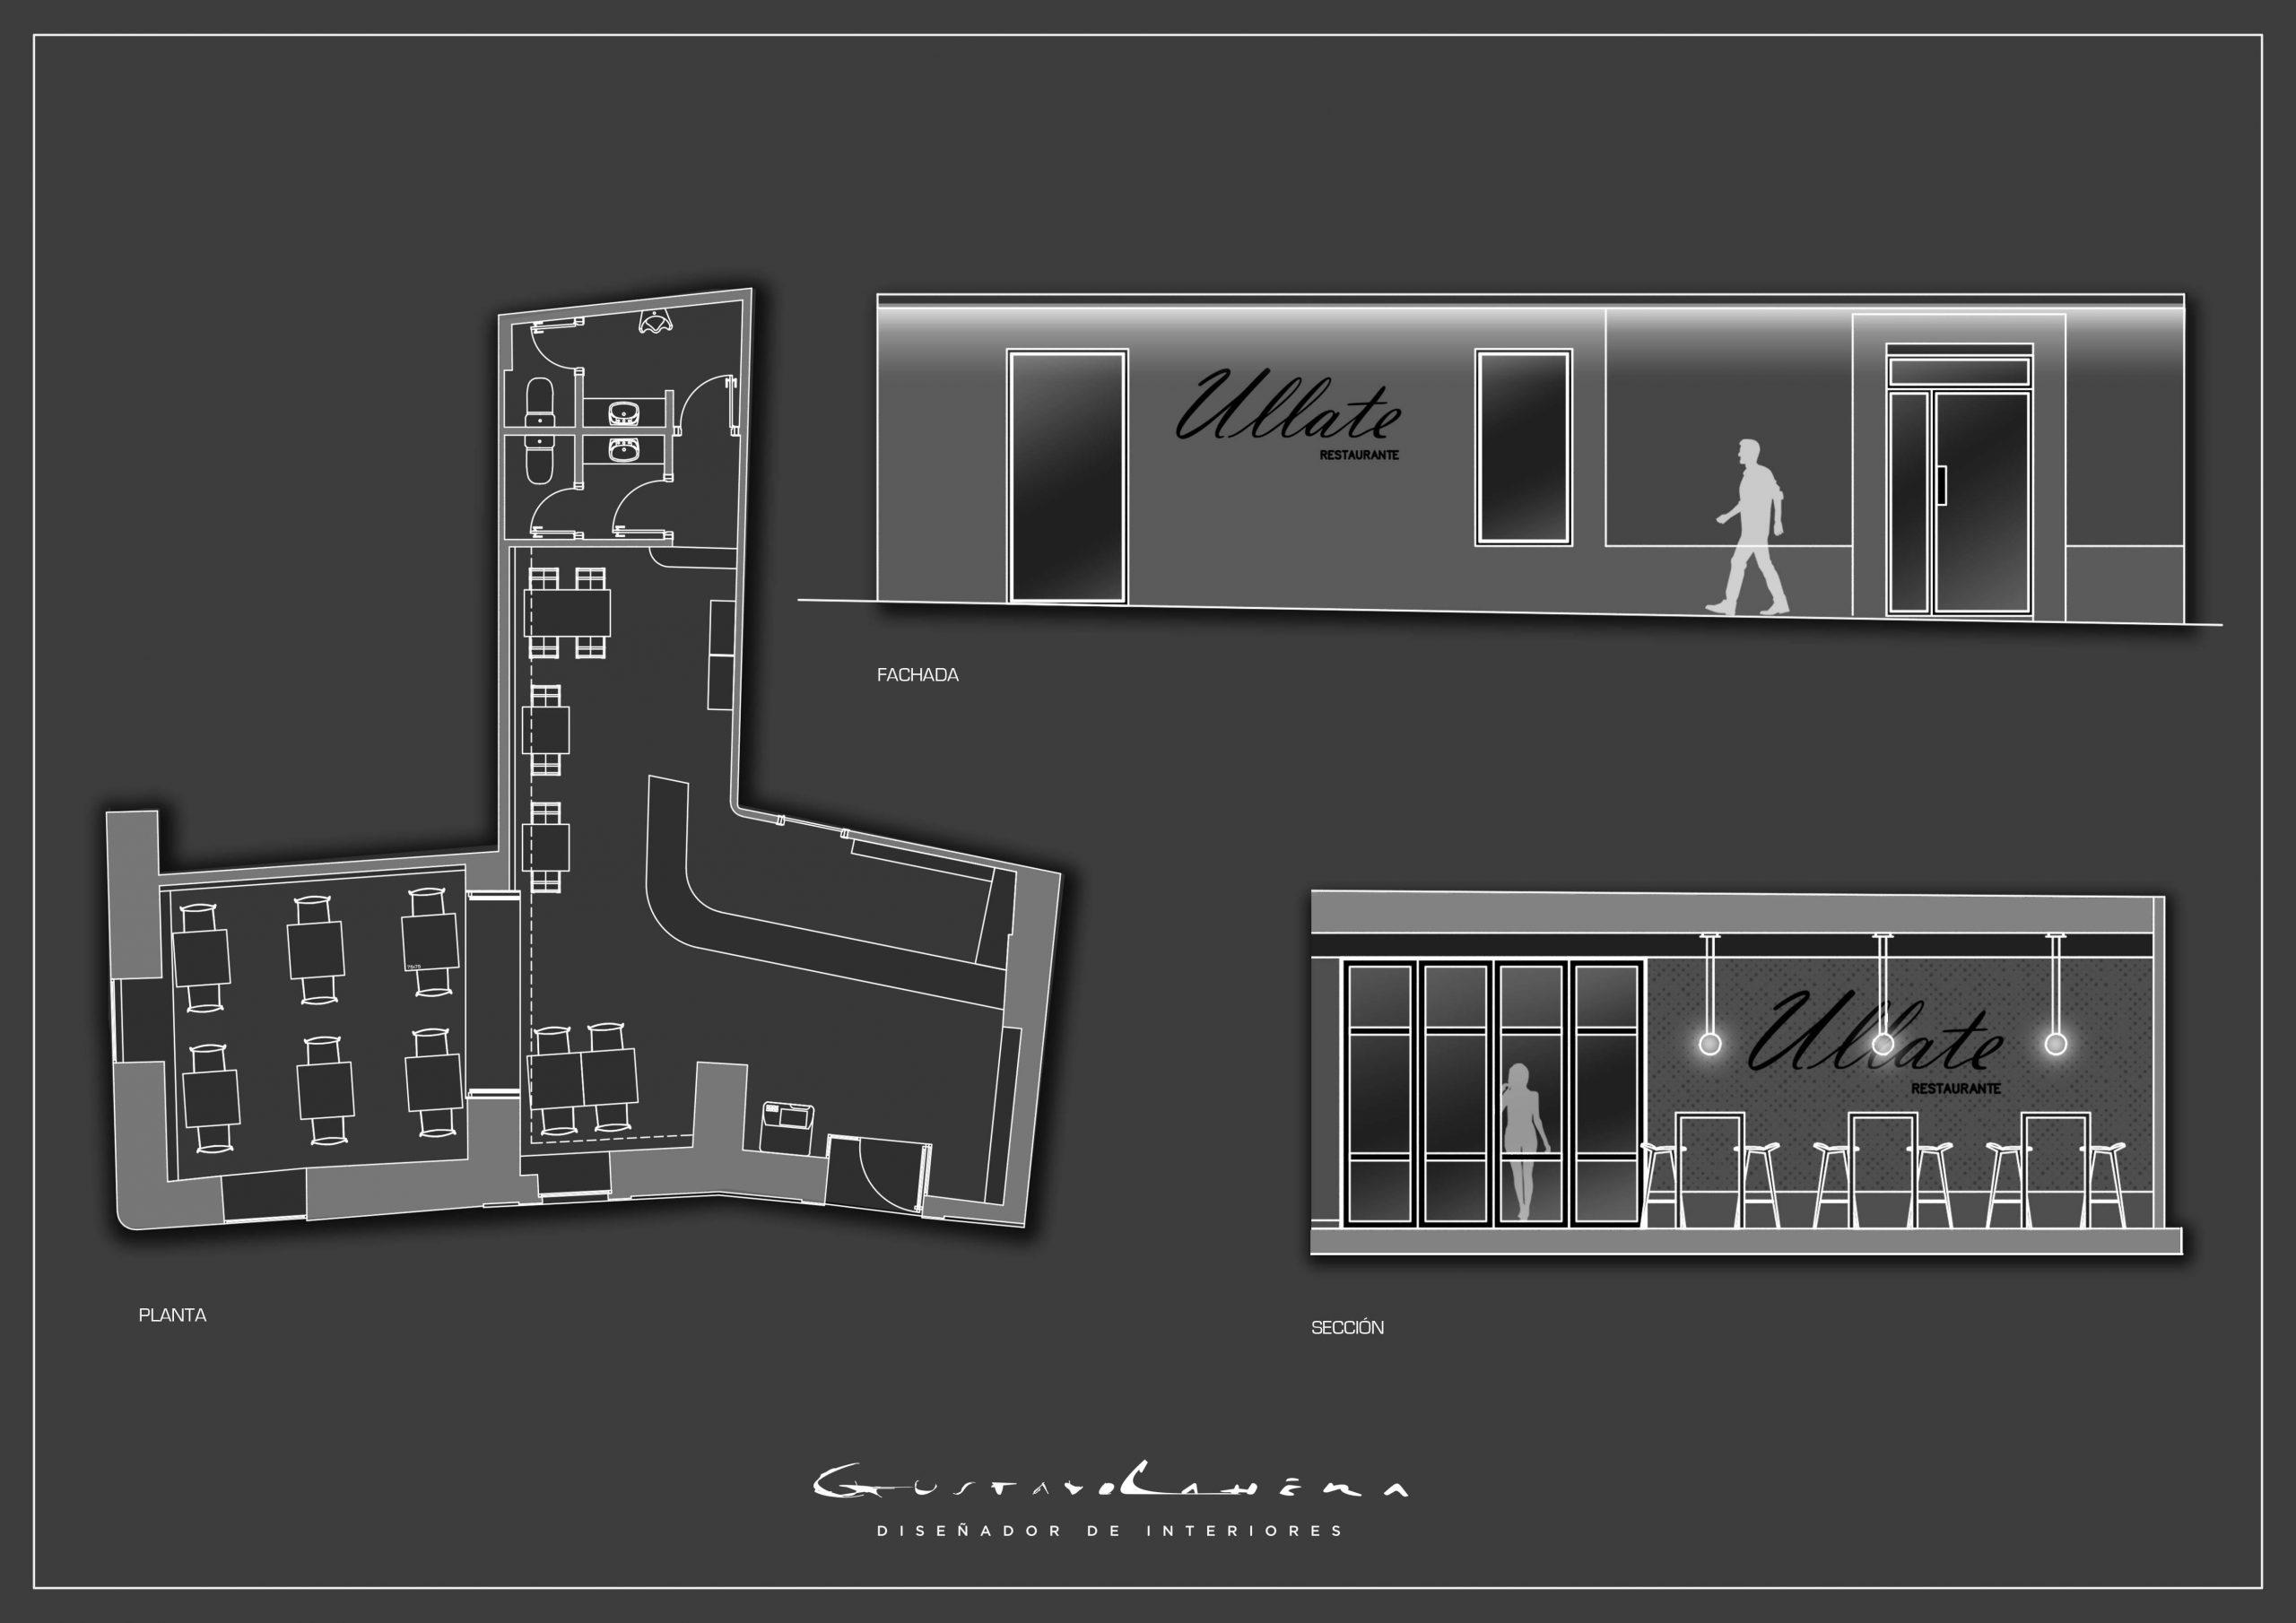 http://gustavolahera.com/wp-content/uploads/2020/11/Foto-0-Restaurante-Ullate-scaled.jpg